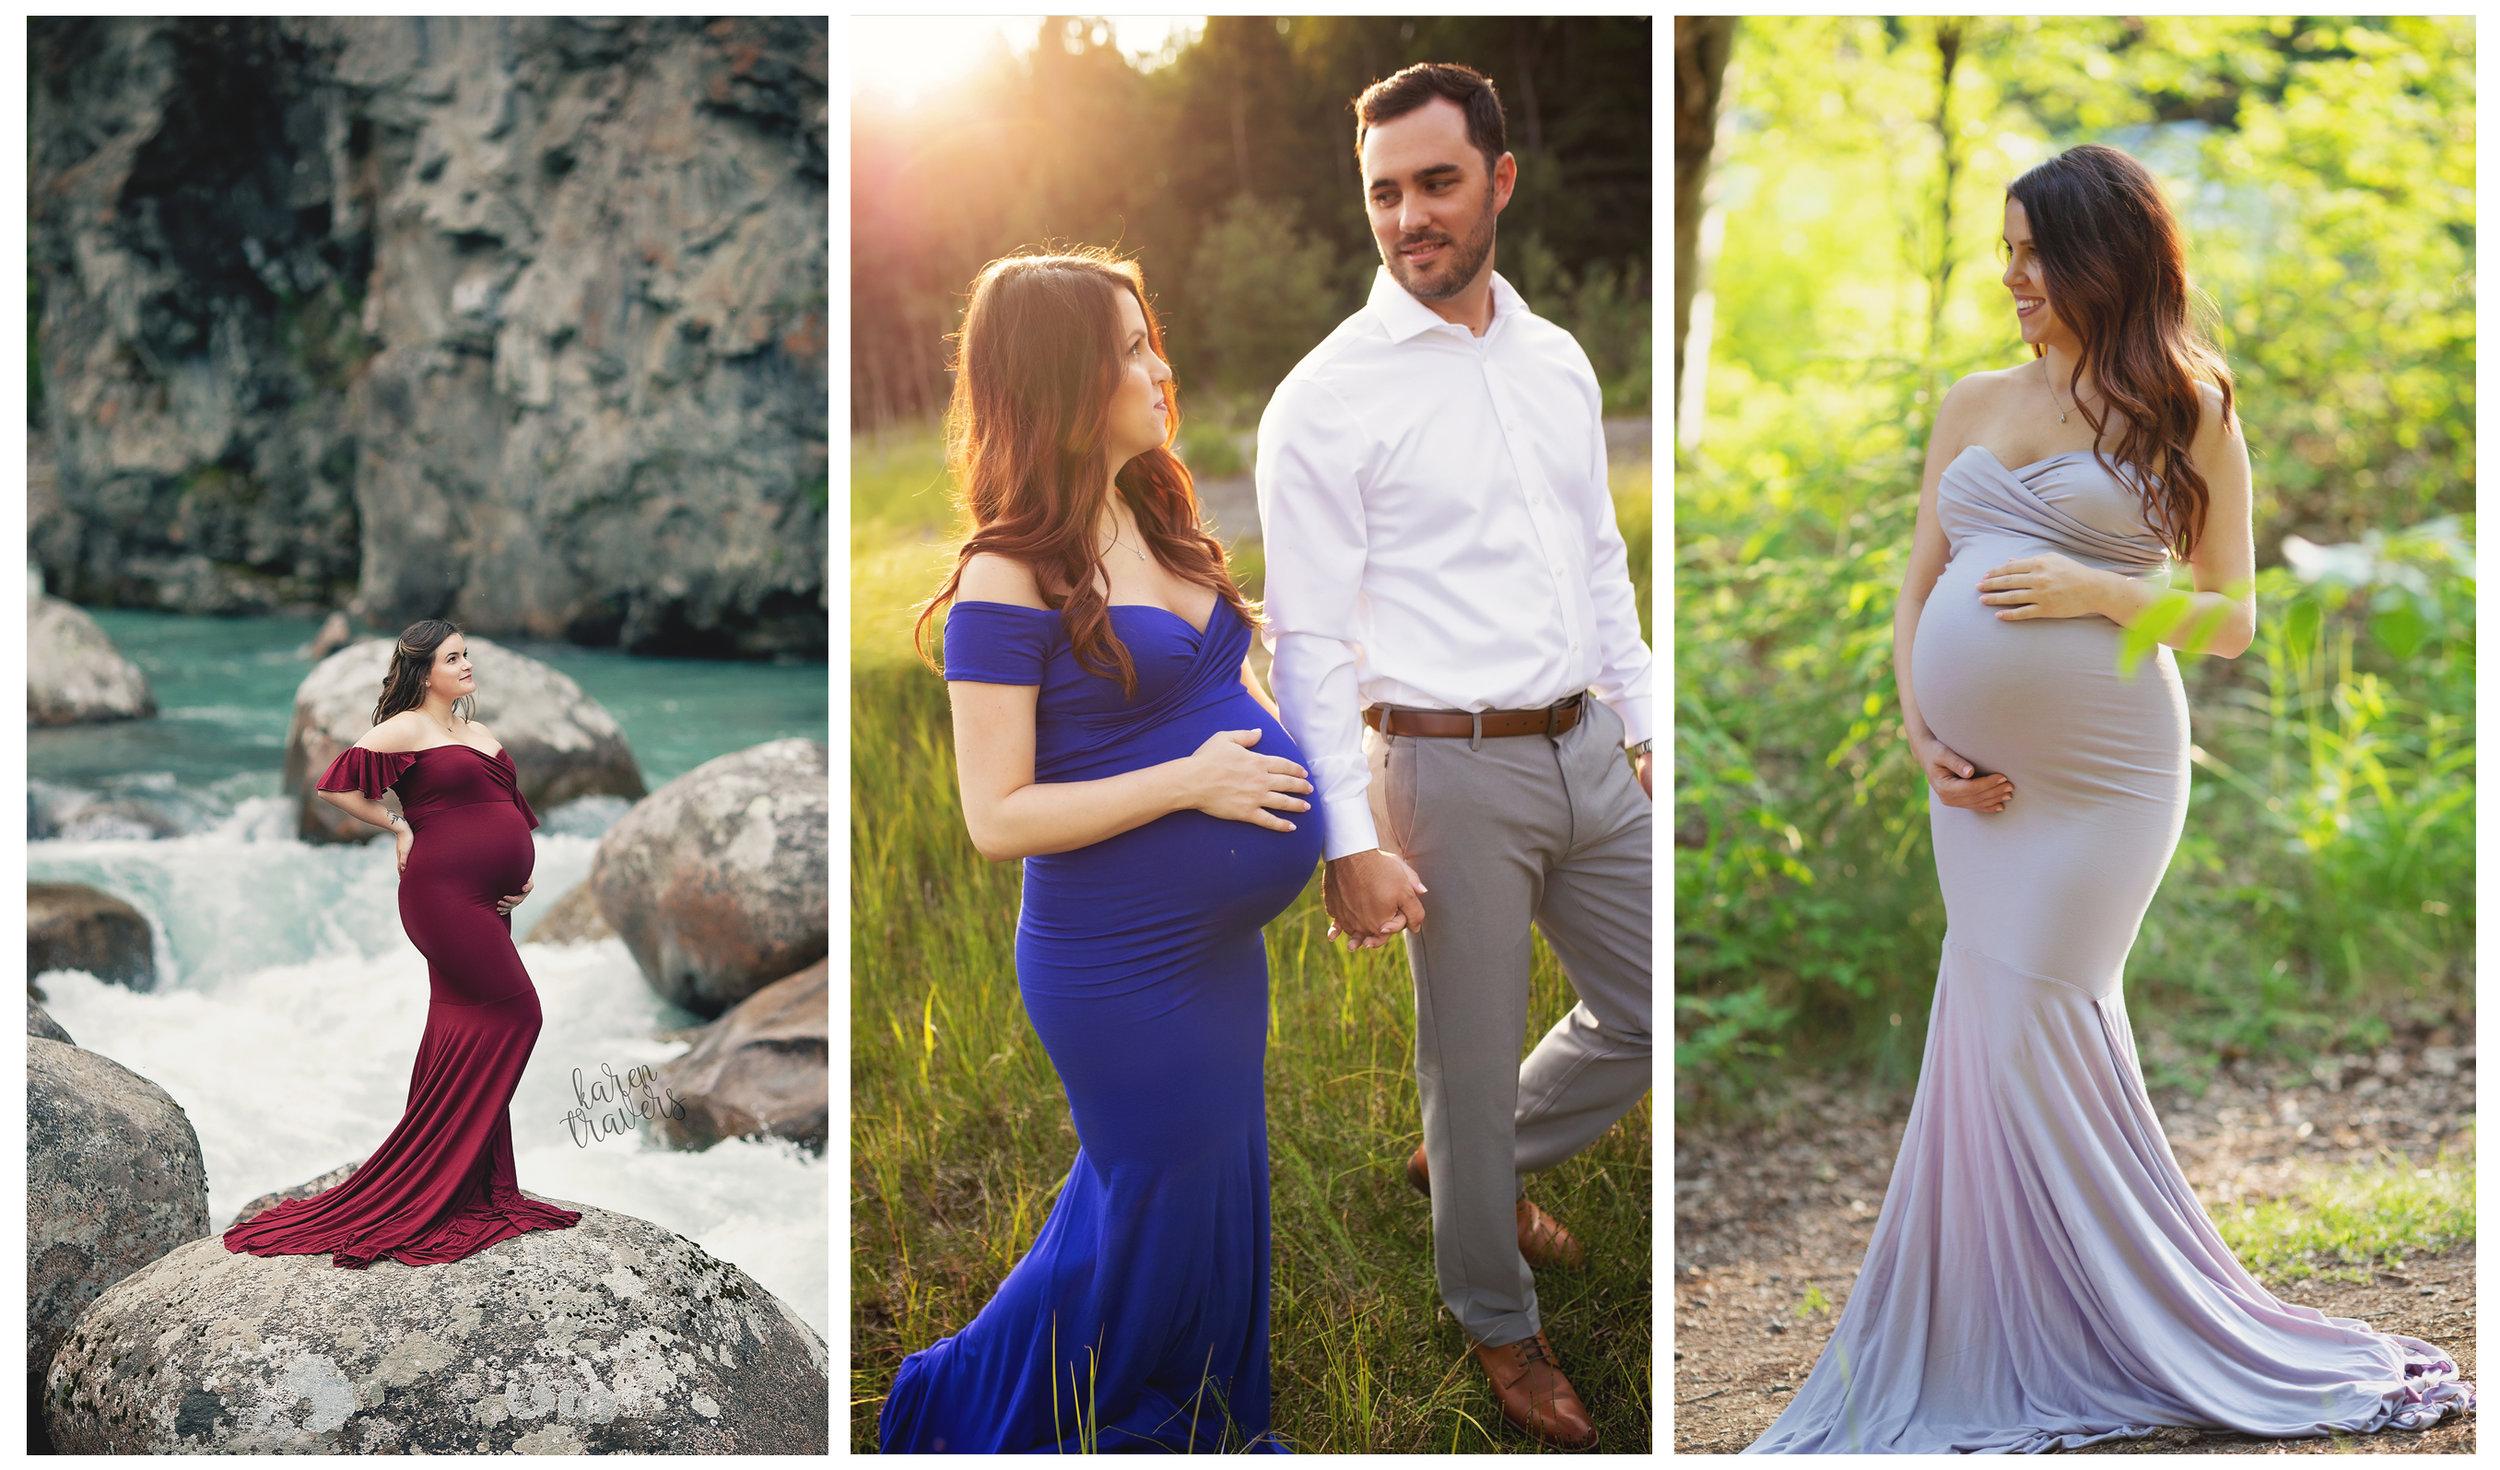 anchorage-maternity-photographer-2.jpg